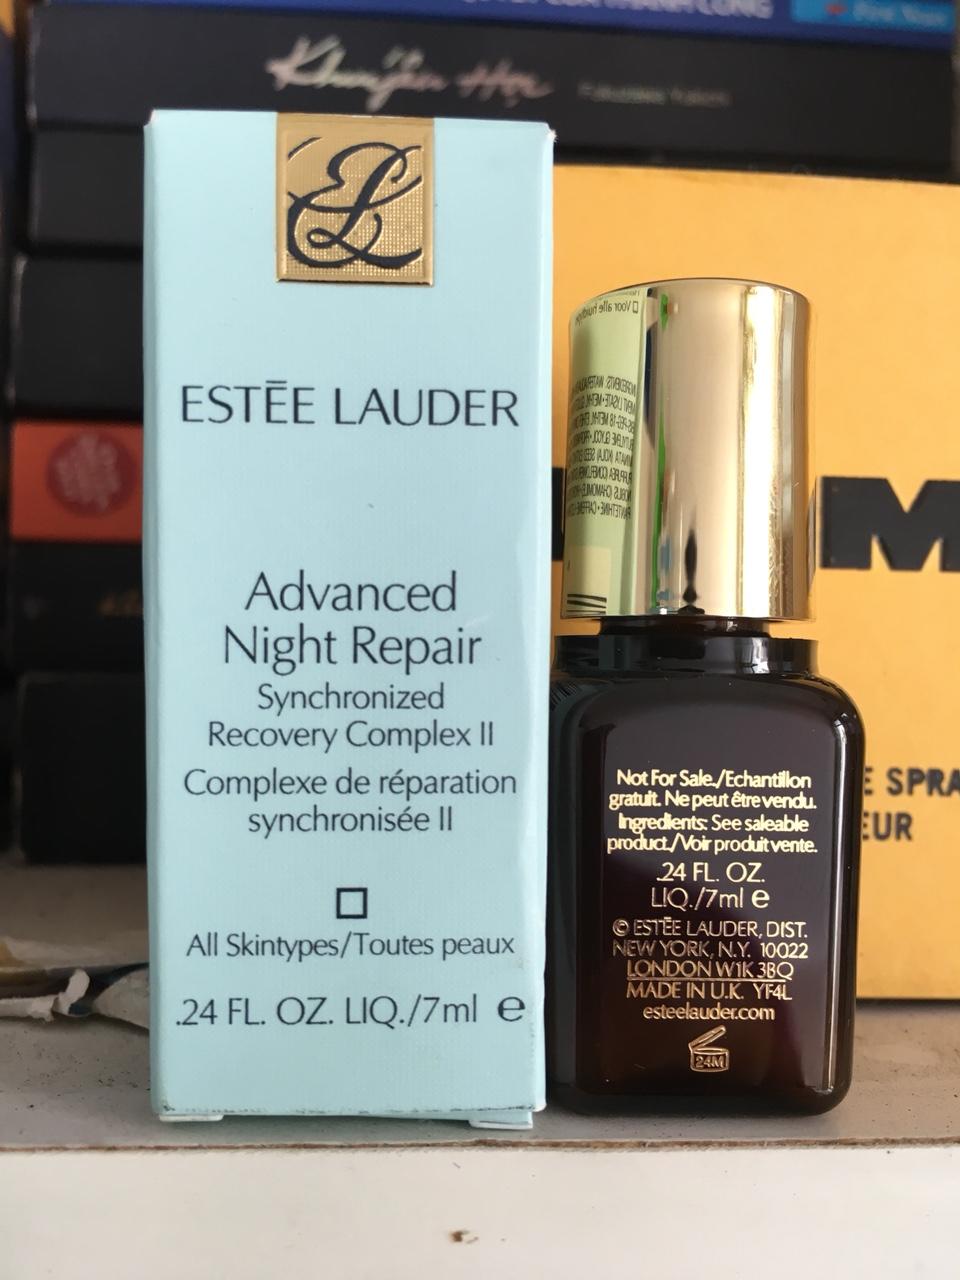 Tinh chất phục hồi da ban đêm Estee Lauder Advanced Night Repair 7ML